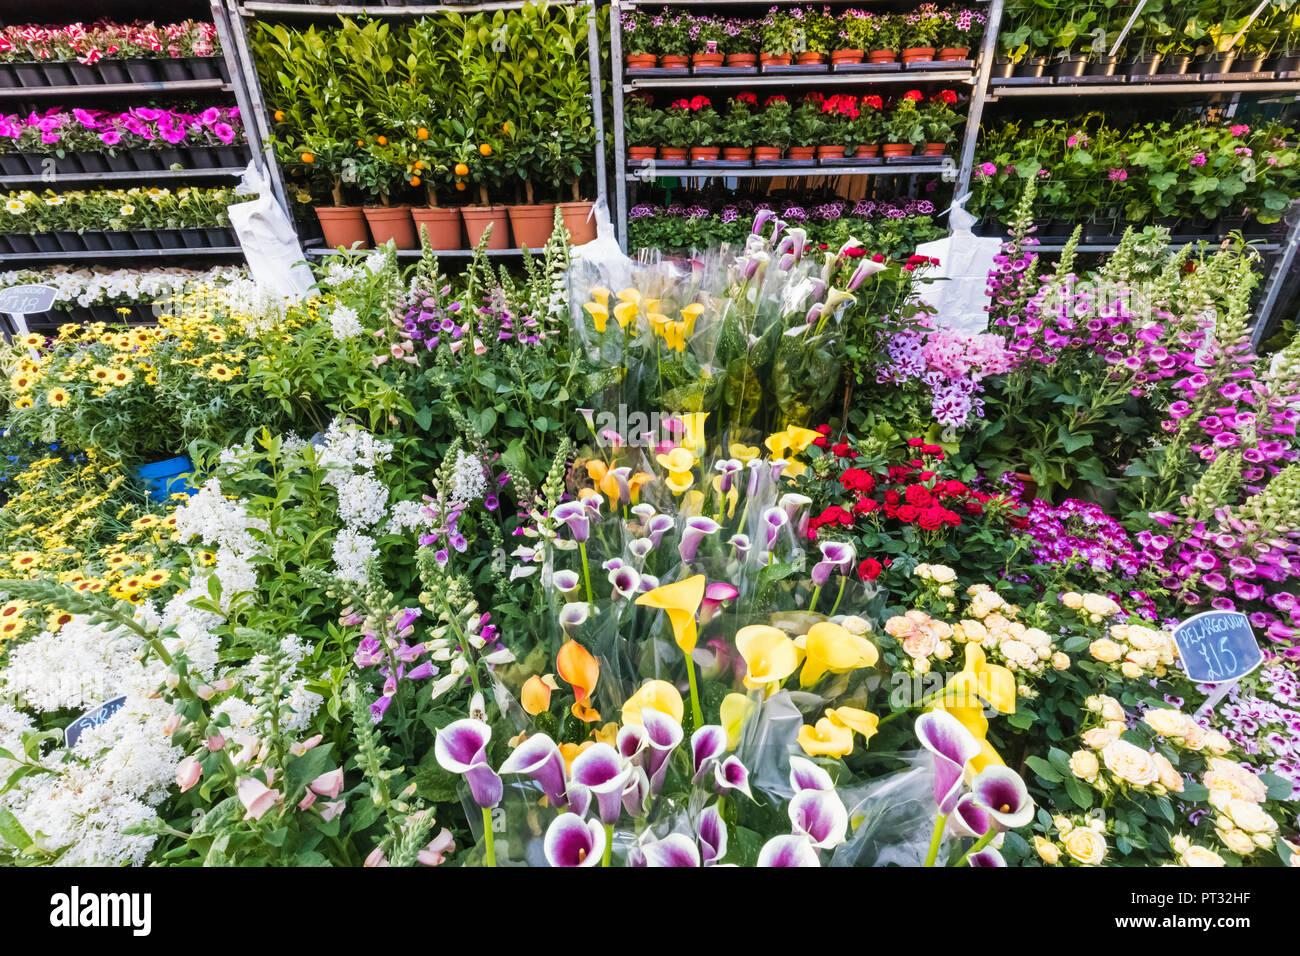 England, London, Columbia Road Flower Market - Stock Image